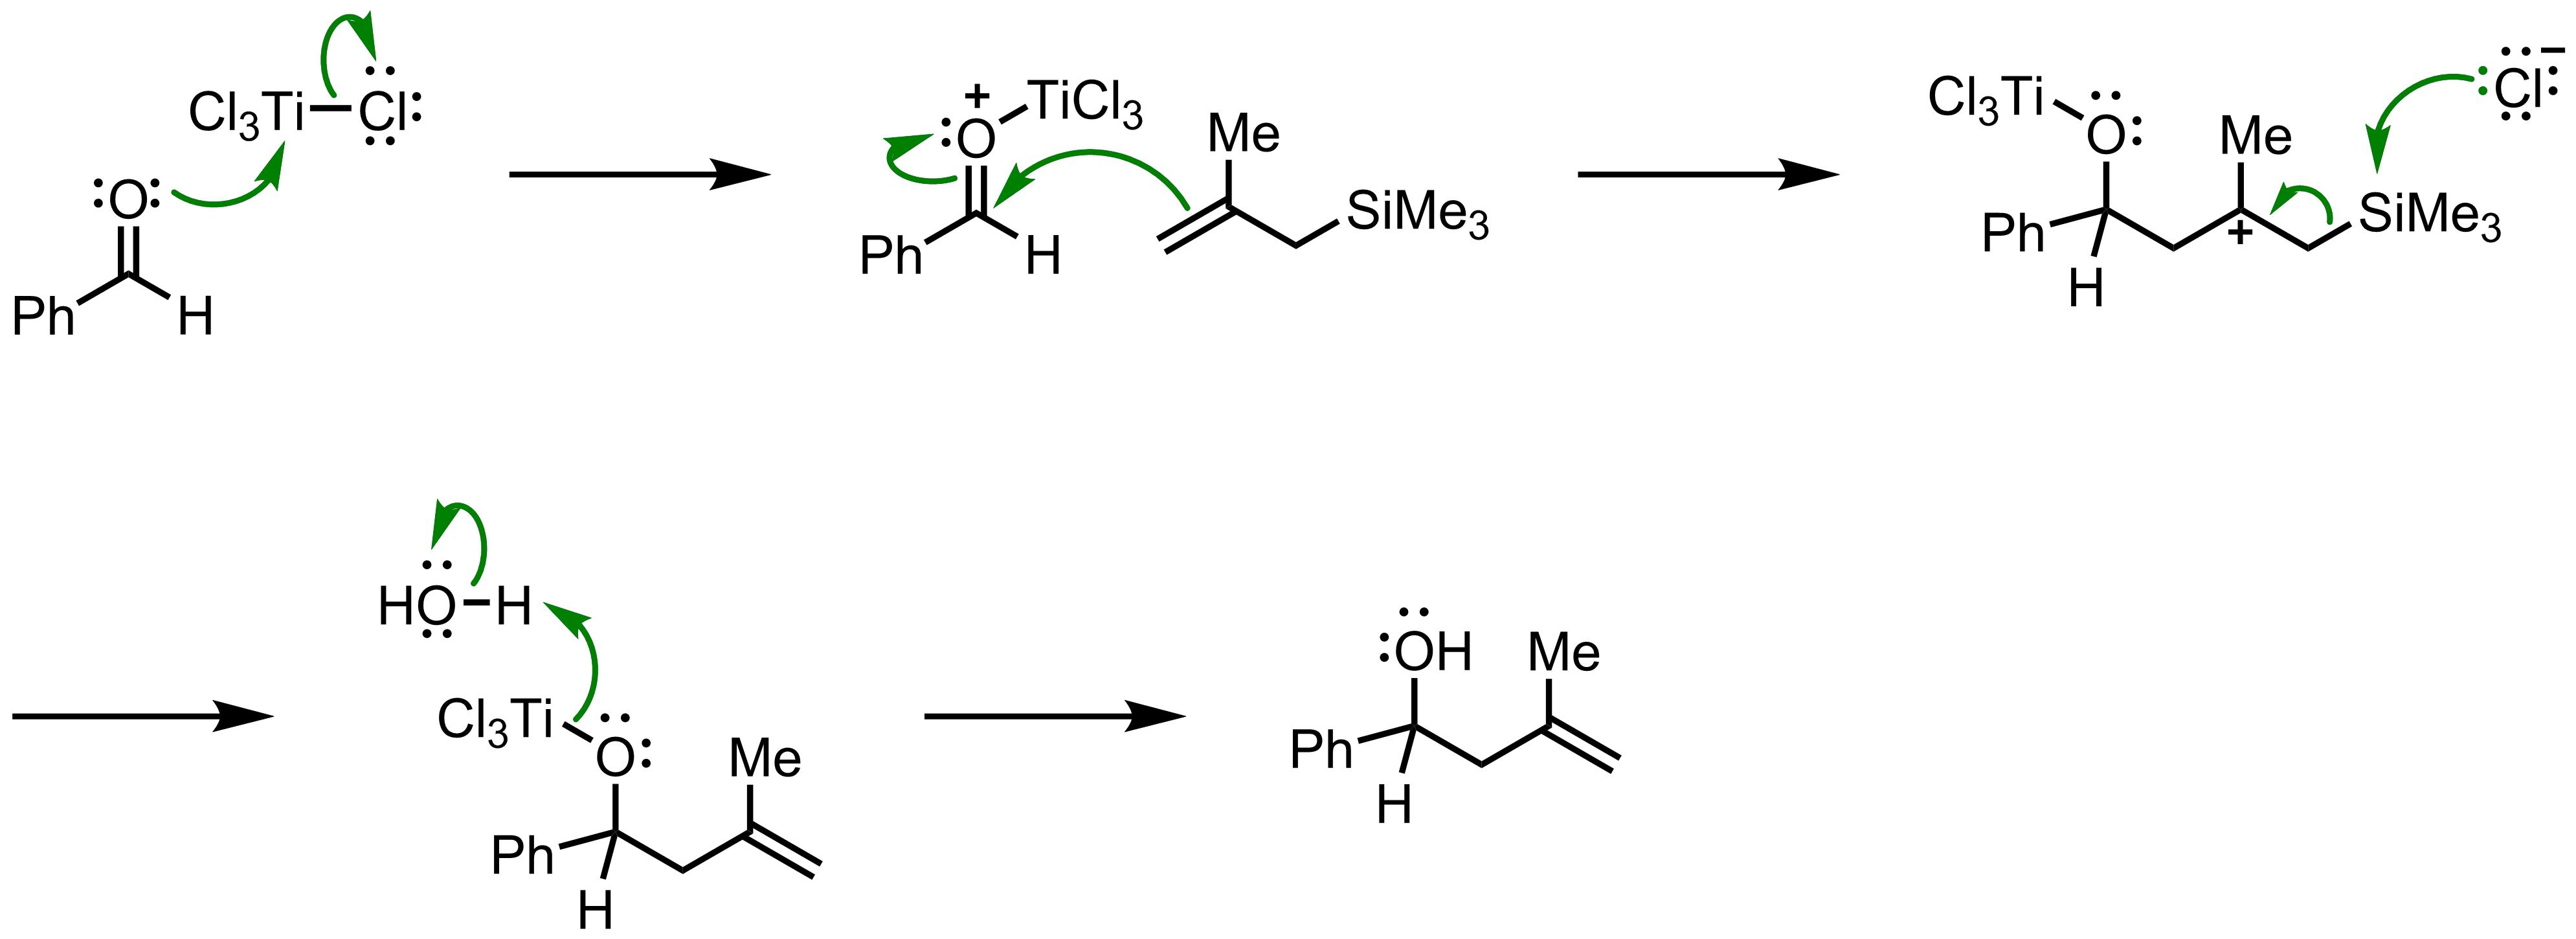 Mechanism of the Hosomi-Sakurai Reaction